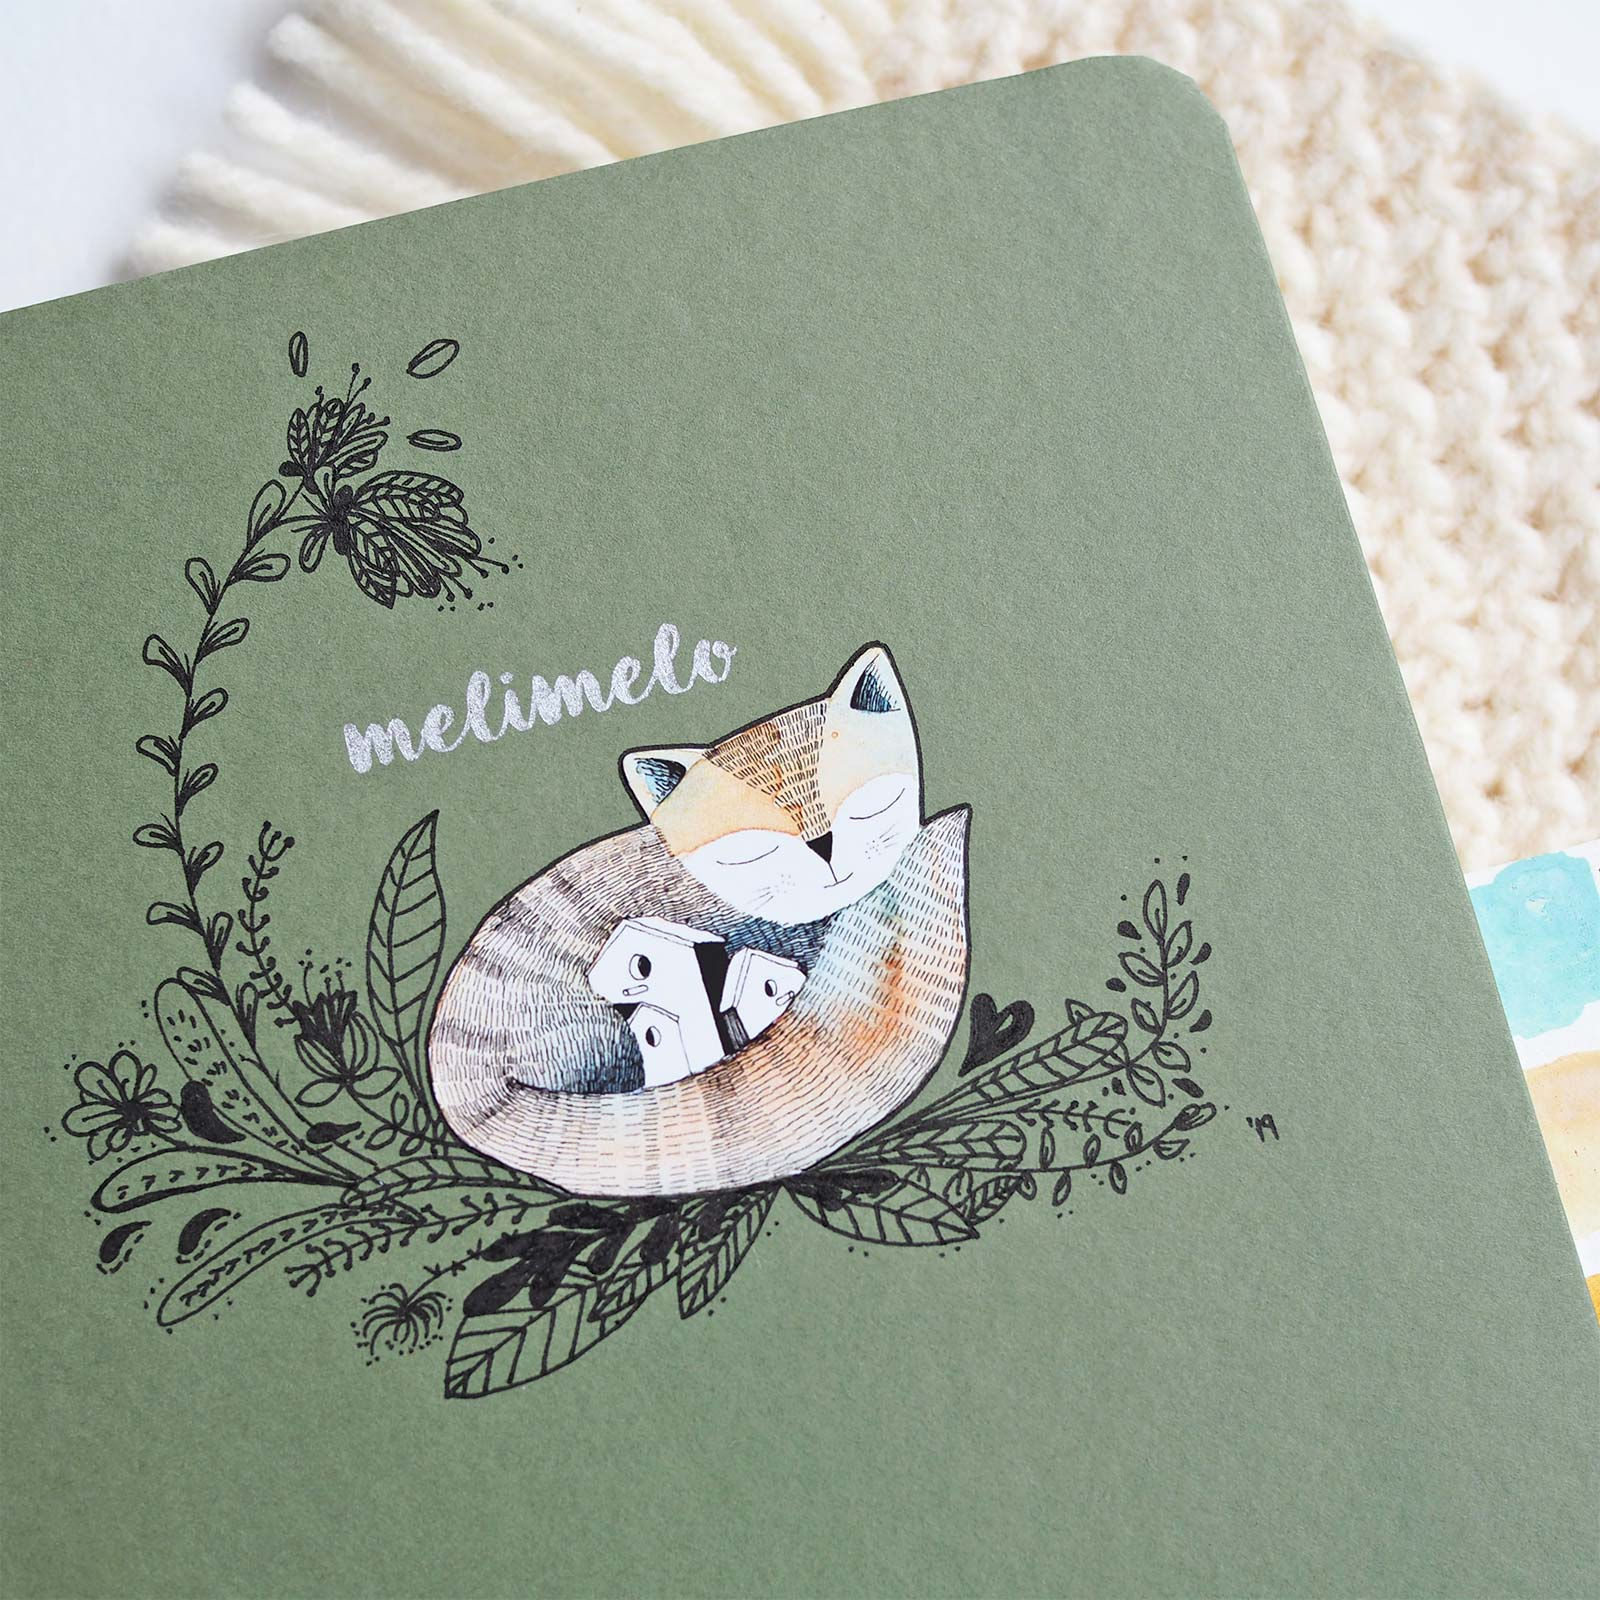 carnet aquarelle mossery renard olalarte sketchbook watercolor doodle fox laboutiquedemelimelo